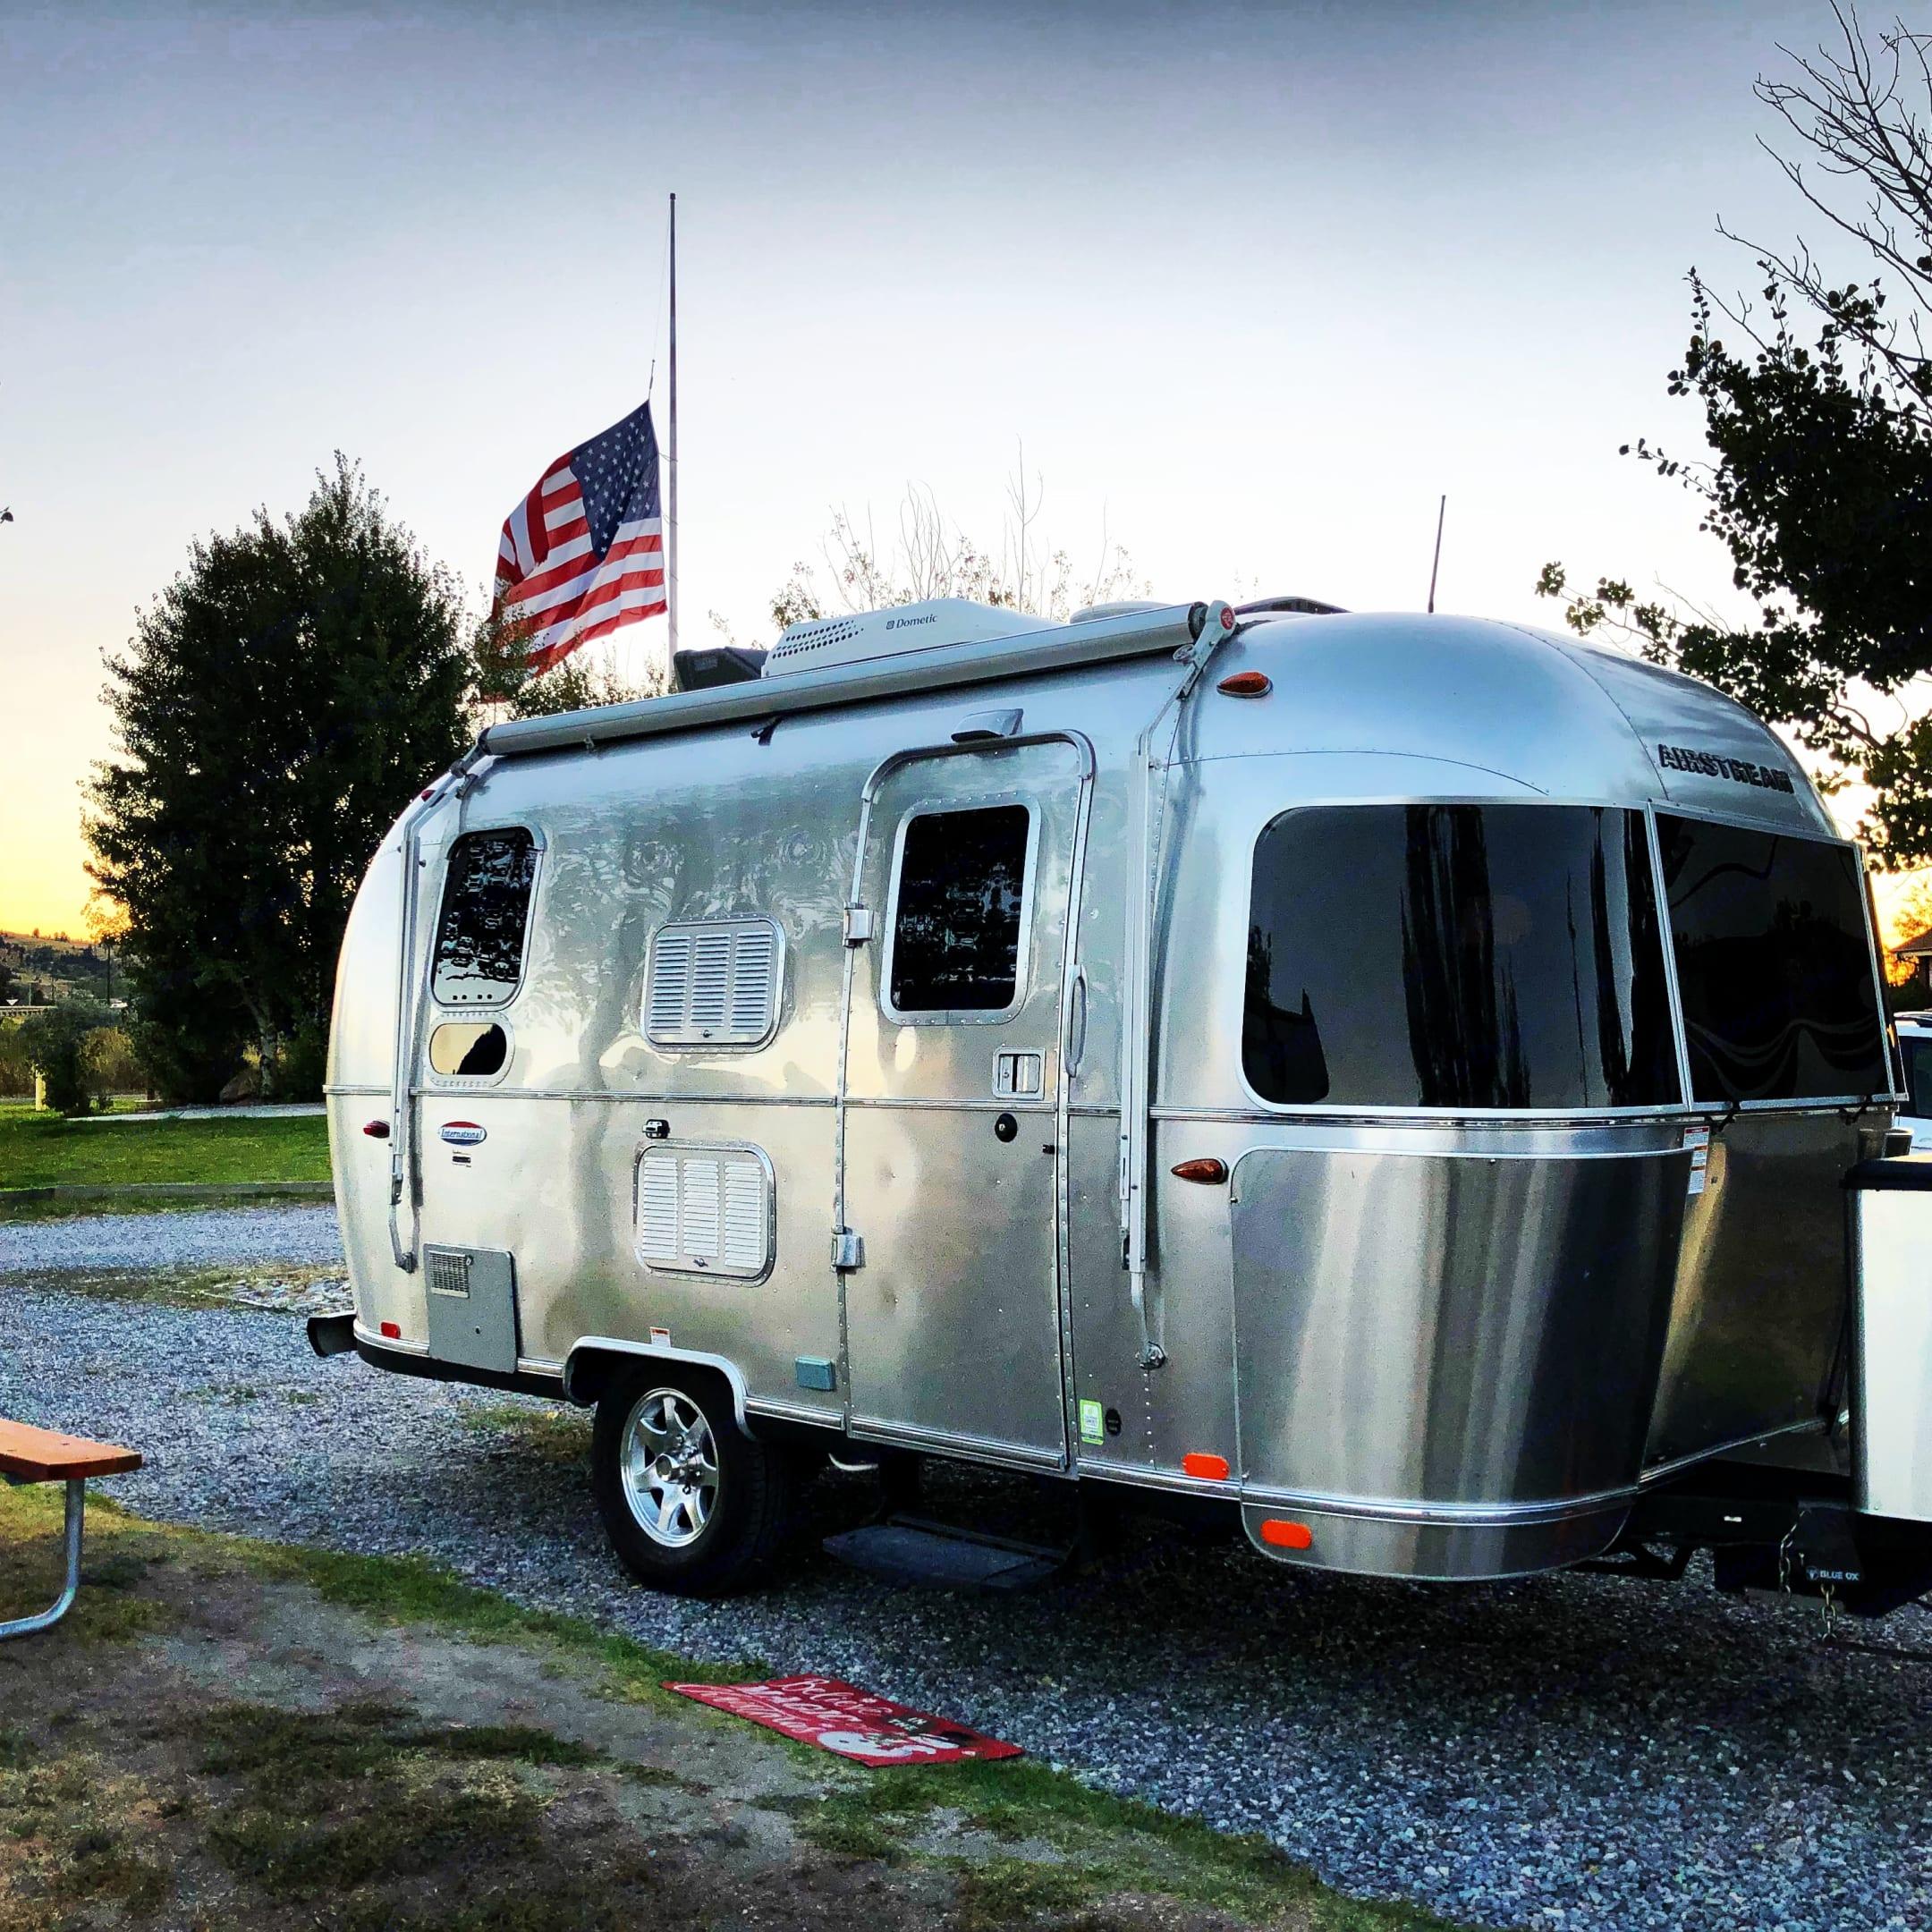 KOA in Butte, Montana. Airstream International 2016